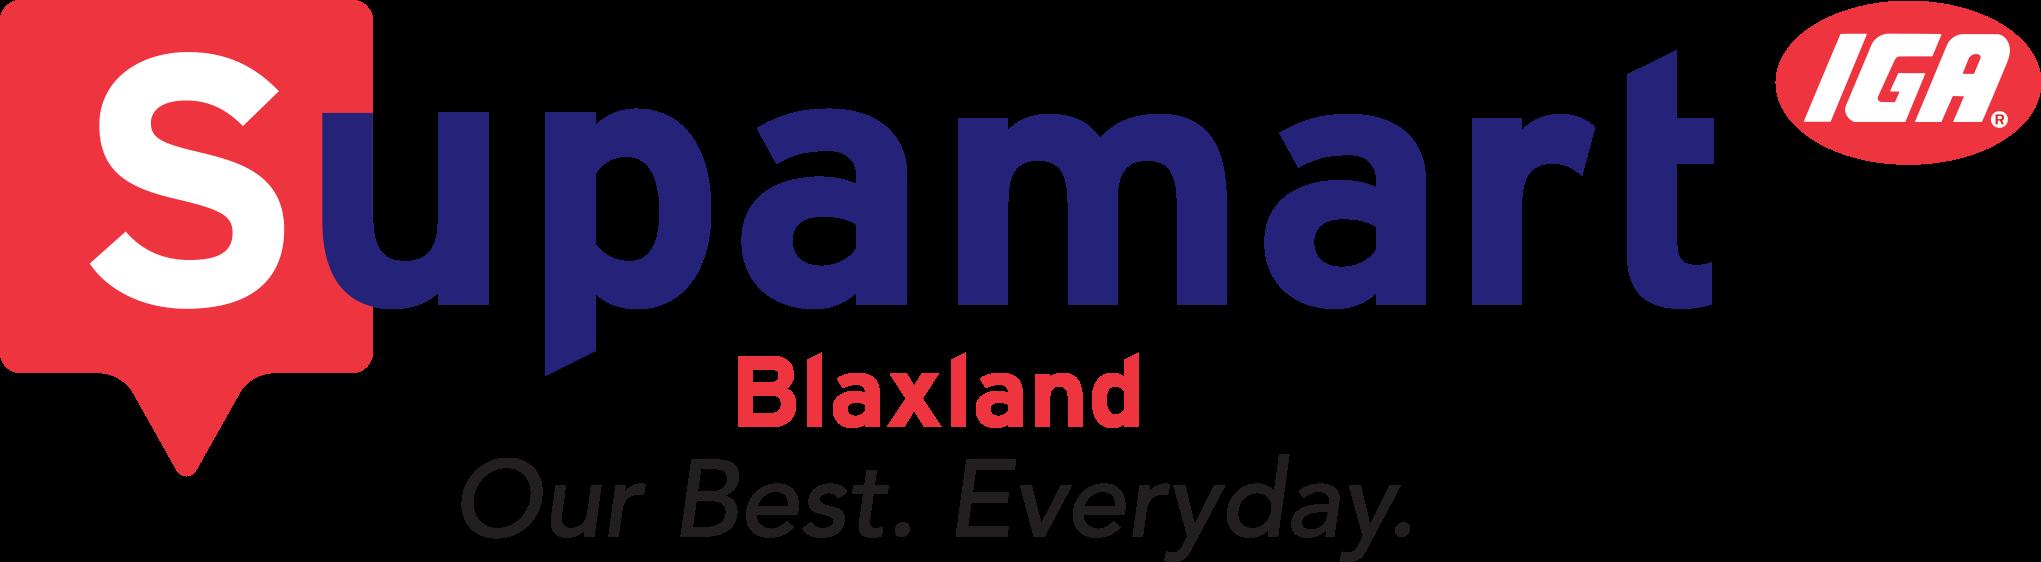 Blaxland Online - SUPA IGA Blaxland